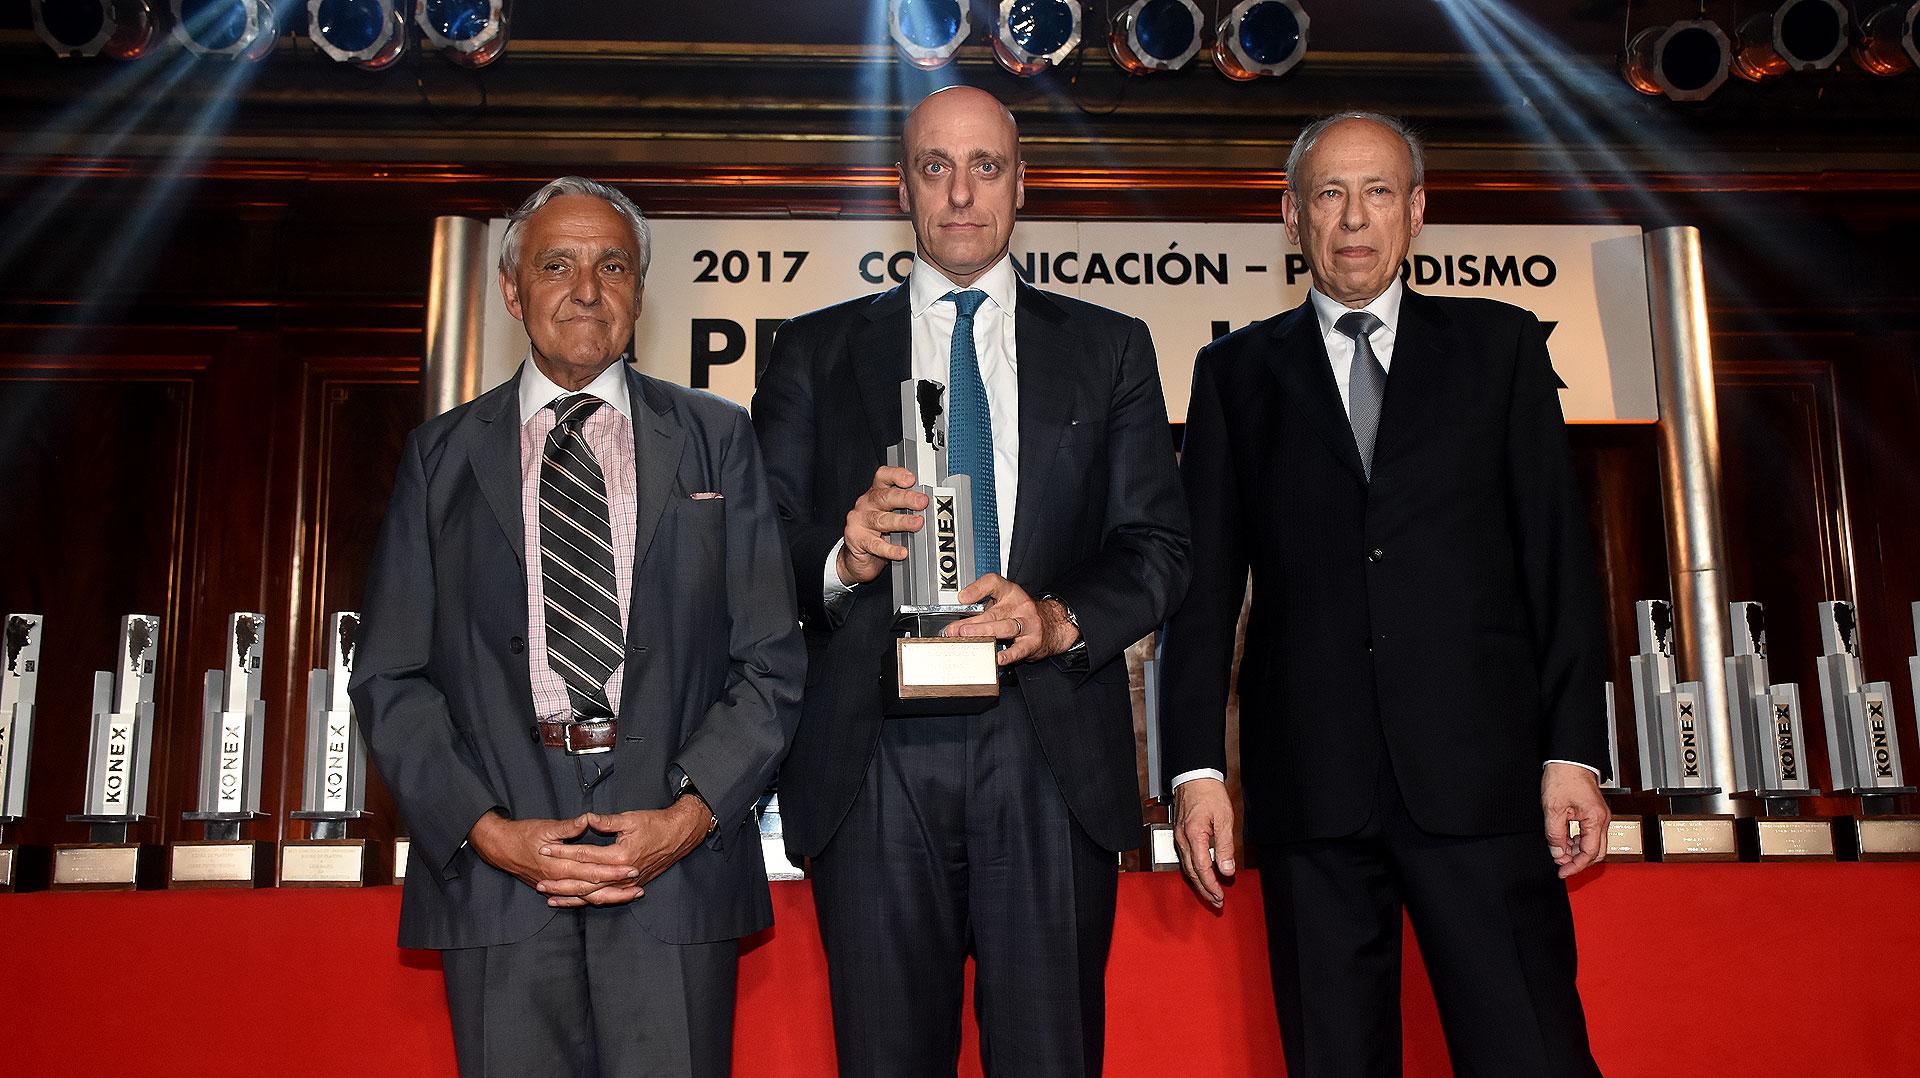 Rosendo Fraga, Carlos Pagni y Luis Ovsejevich